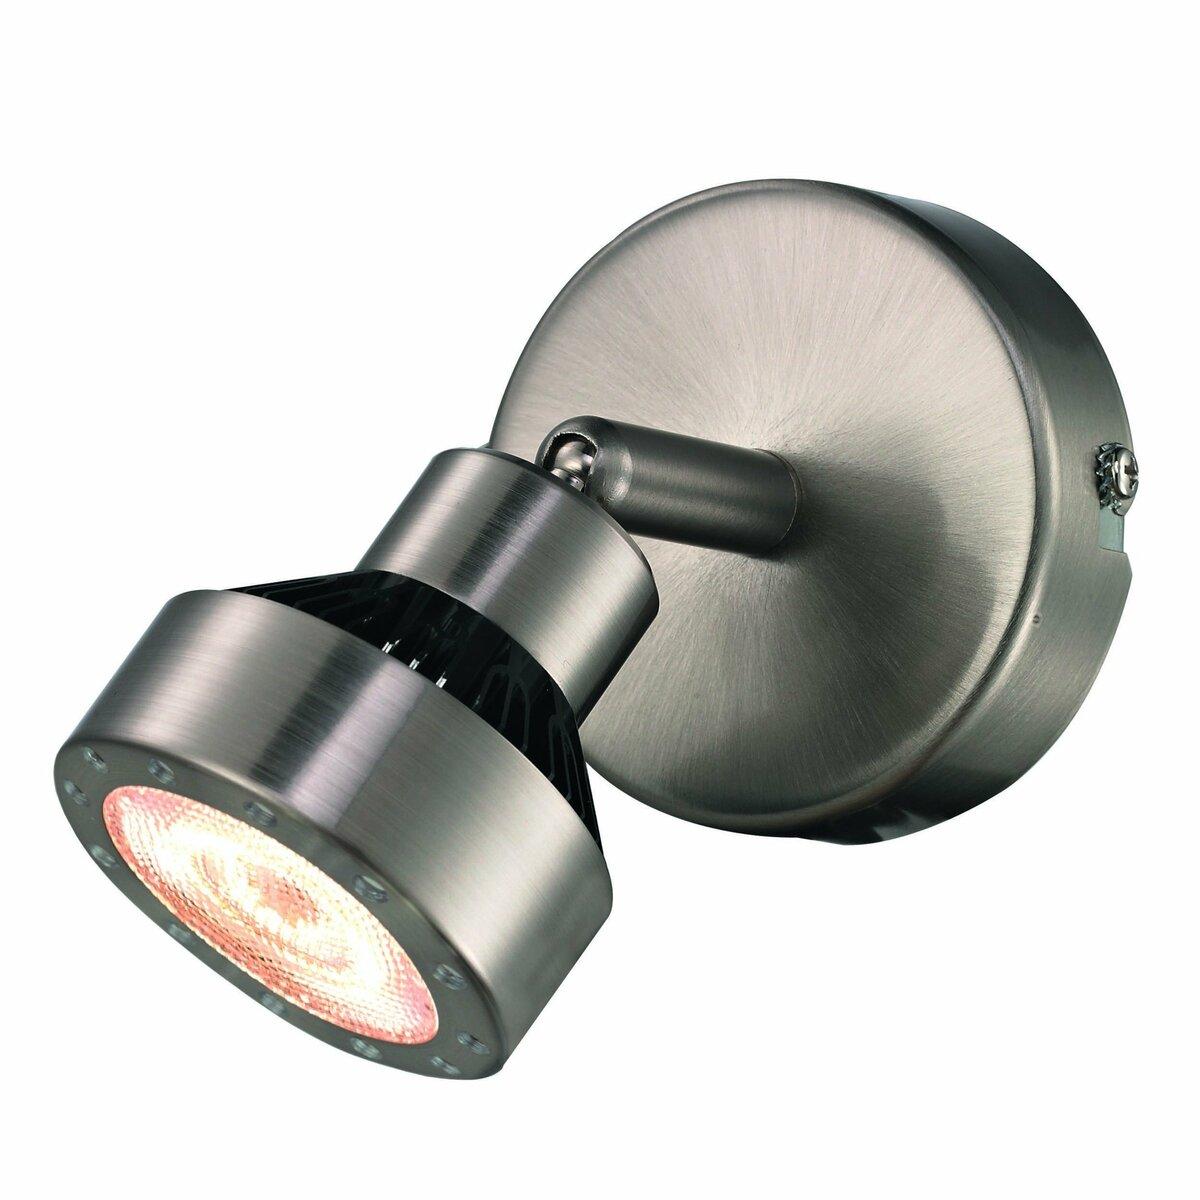 Bild 1 von DesignLive LED-Strahler   Alster